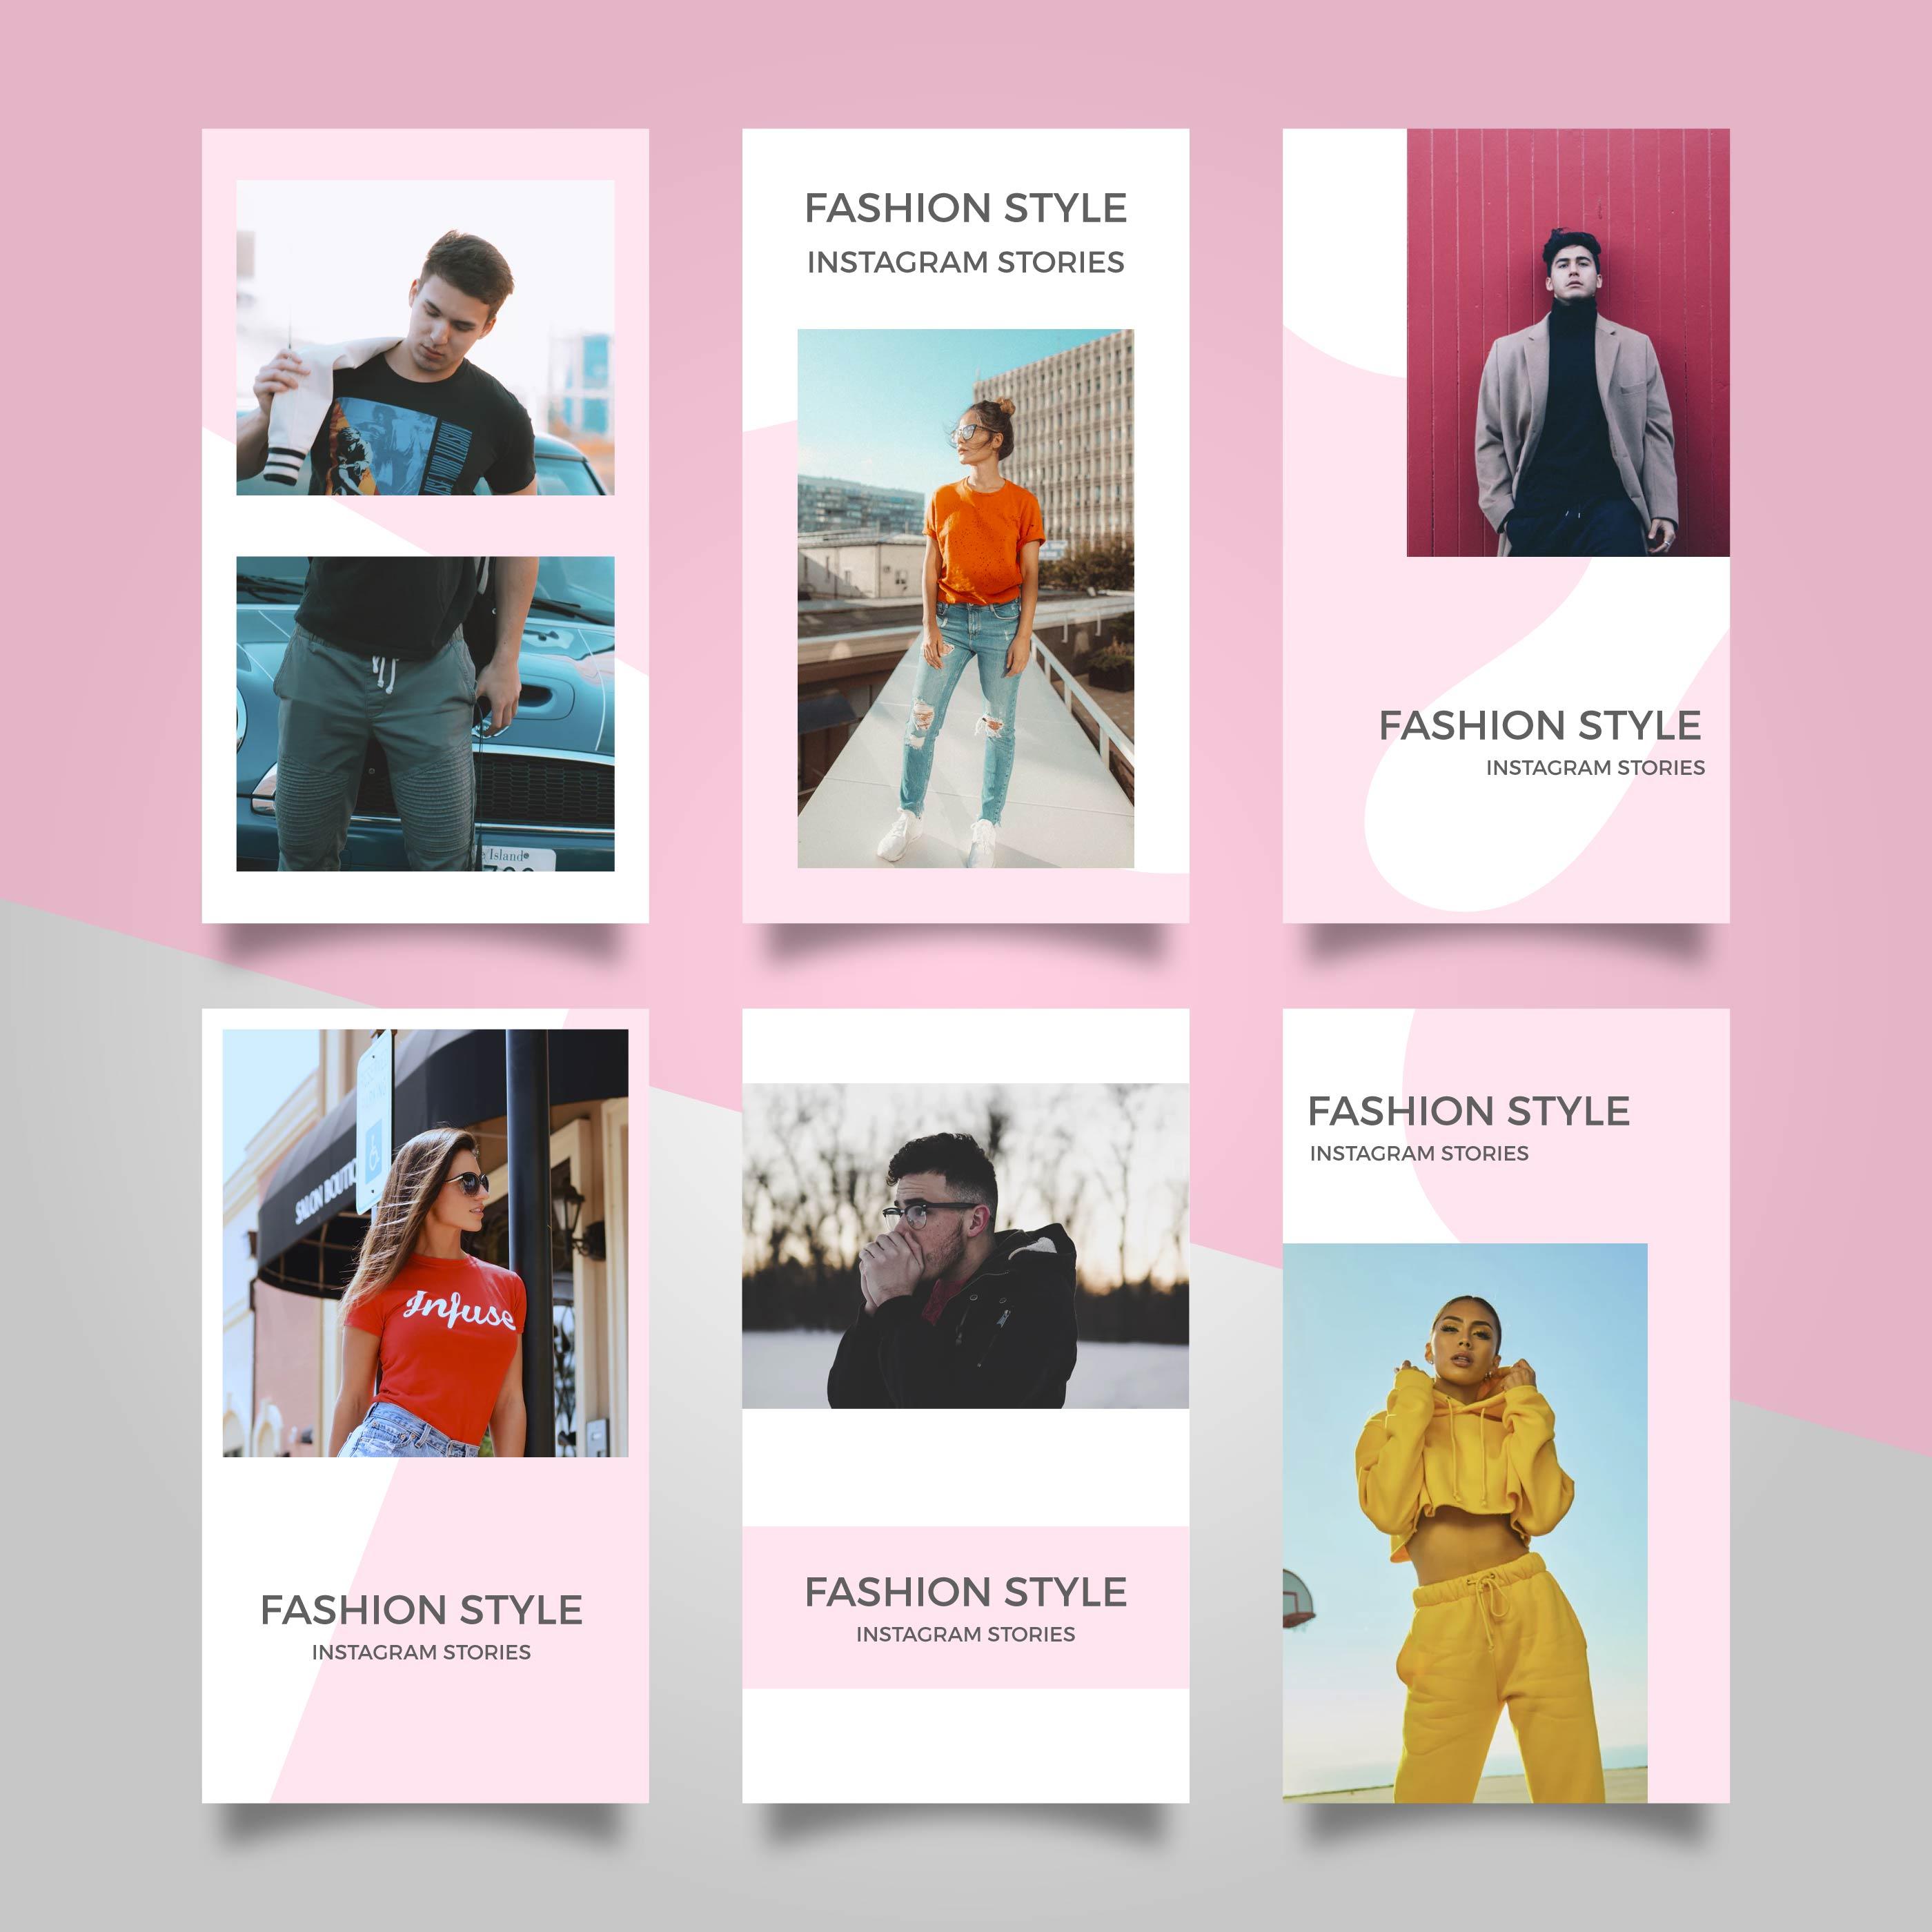 Vector Illustration Instagram: Flat Modern Pink Fashion Instagram Stories Vector